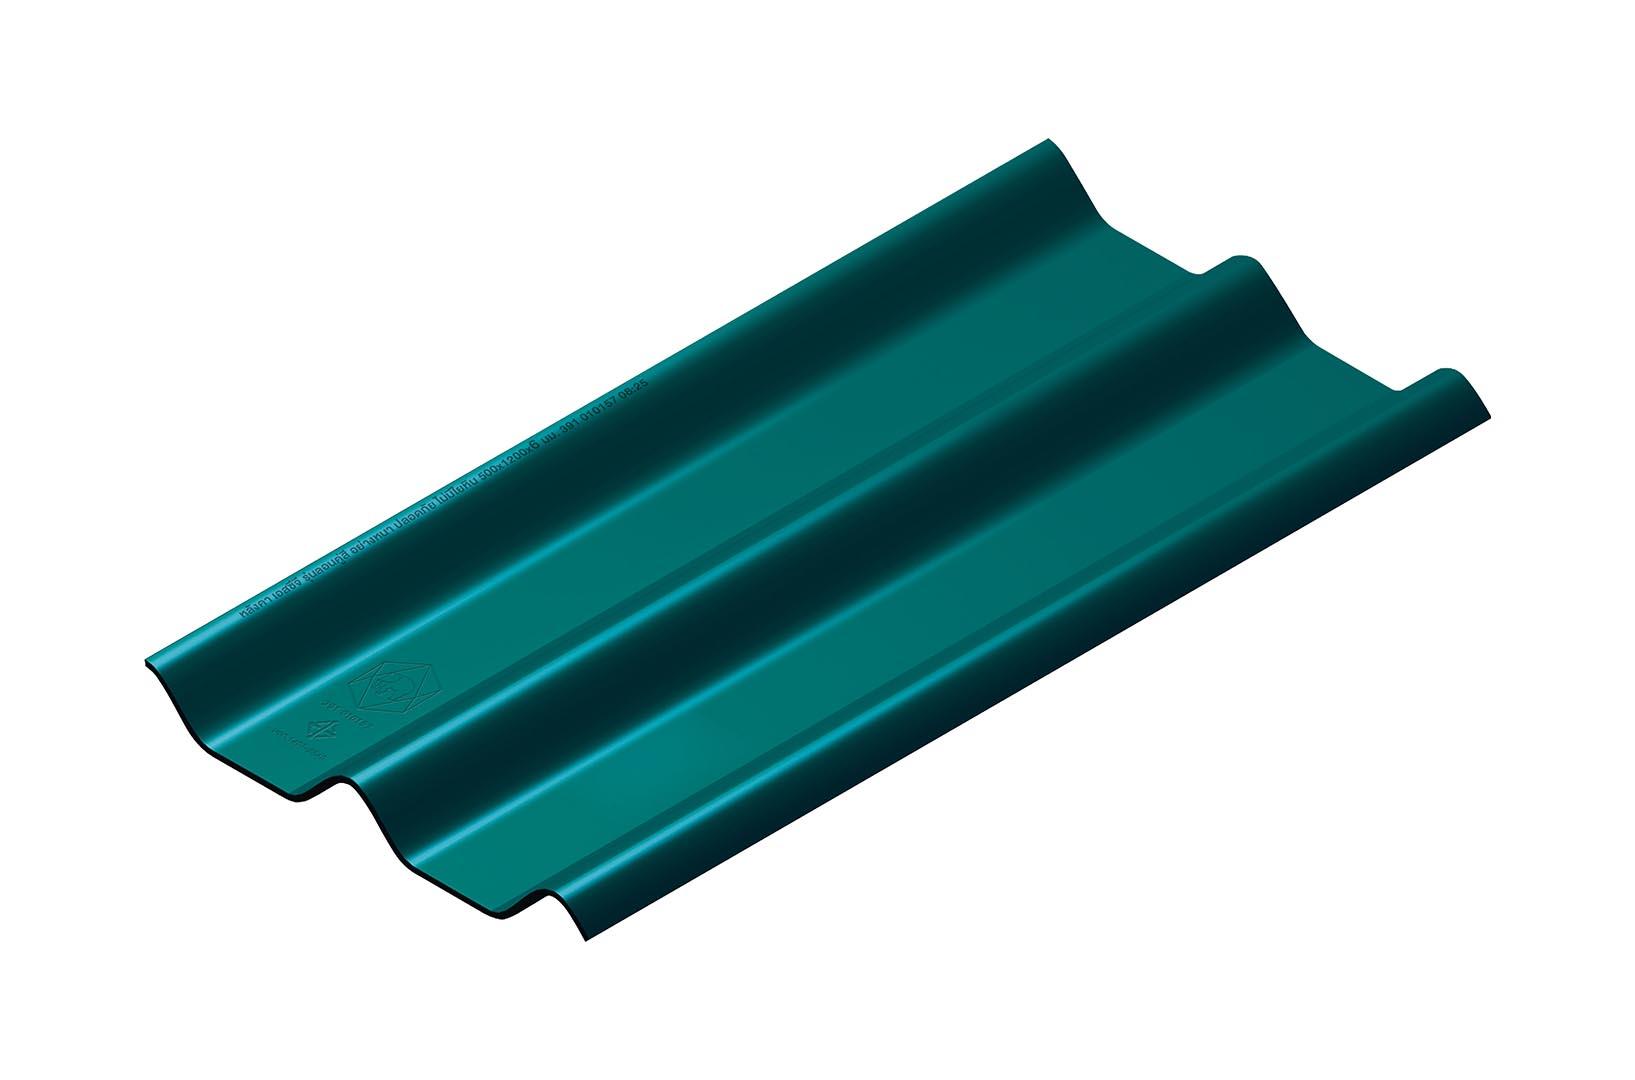 SCG-Fiber-Cement-Roof-Roman-Tile-Marine-Green